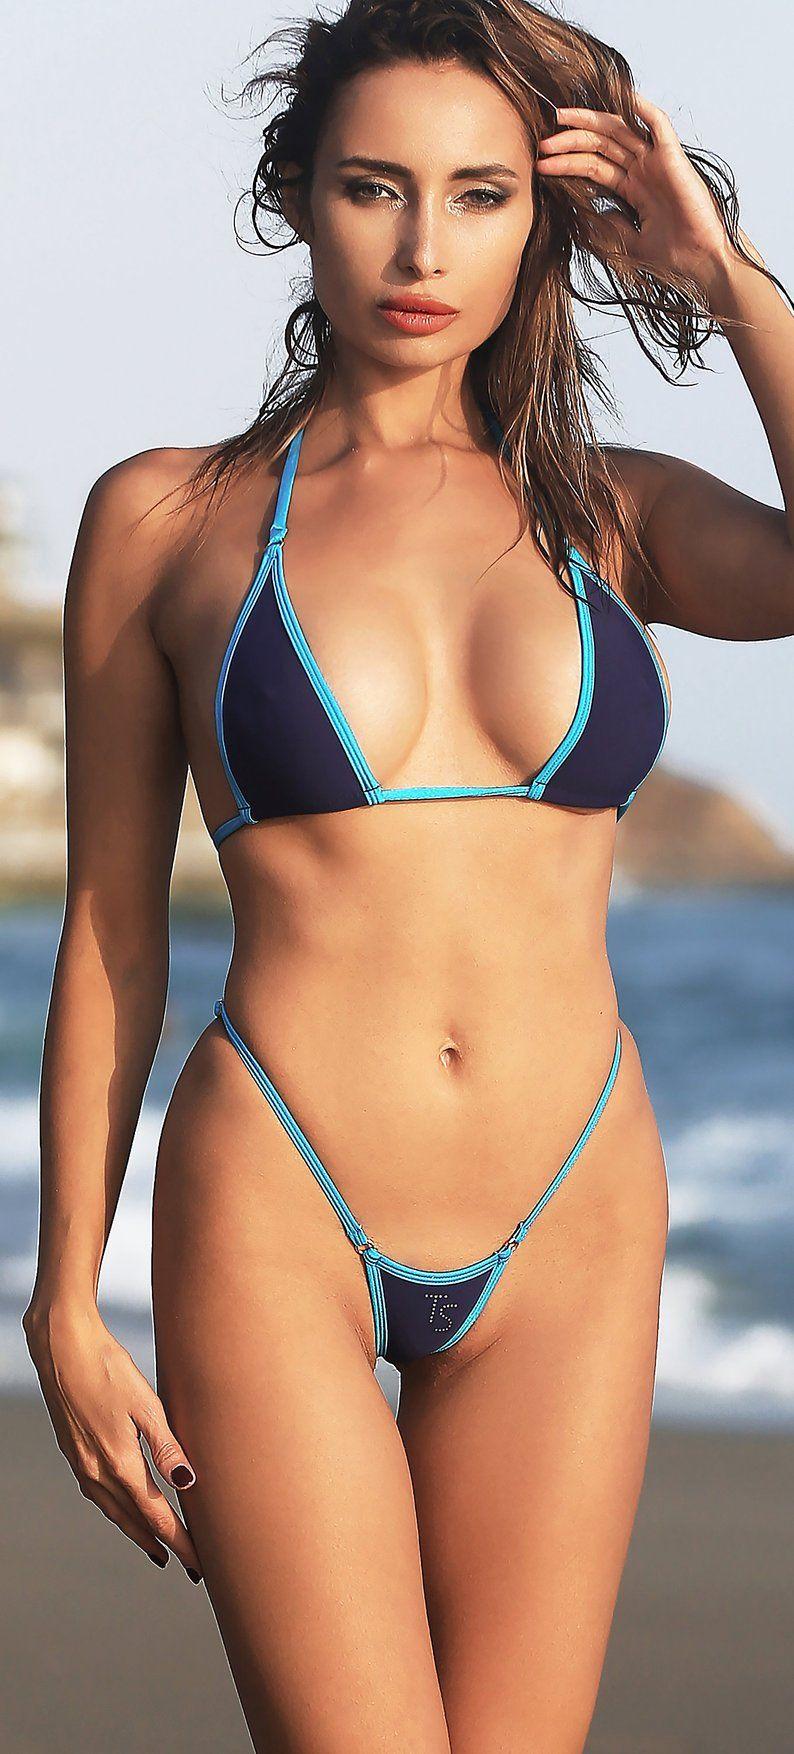 858d3cafbd7 Sexy Womens swimwear Thong Micro bikini set Erotic two piece ...